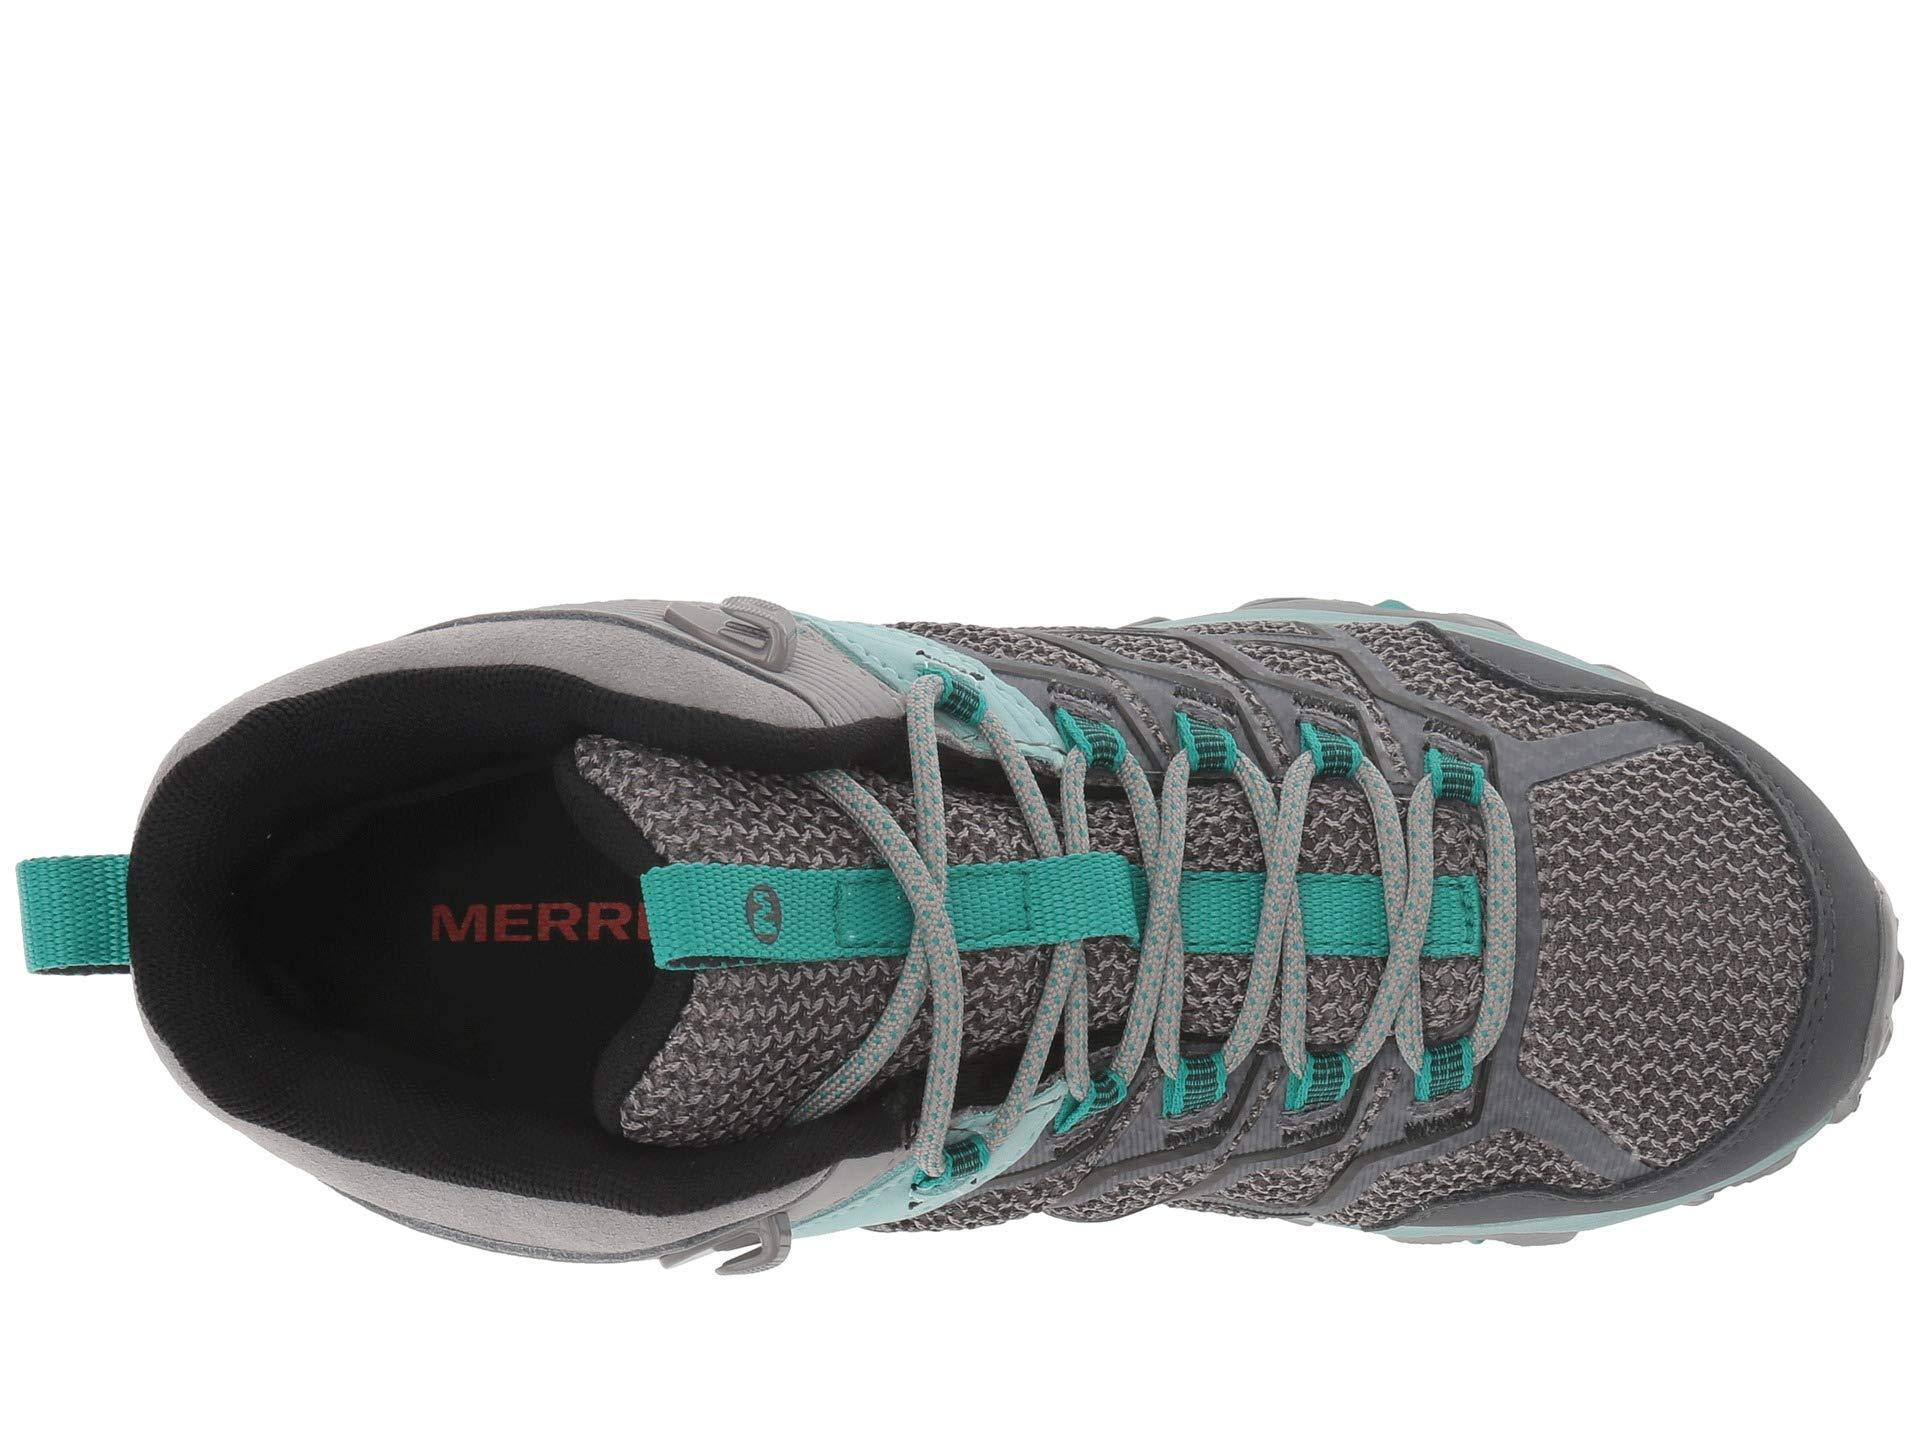 95297f6c69a Merrell - Multicolor Moab Fst 2 Mid Waterproof - Lyst